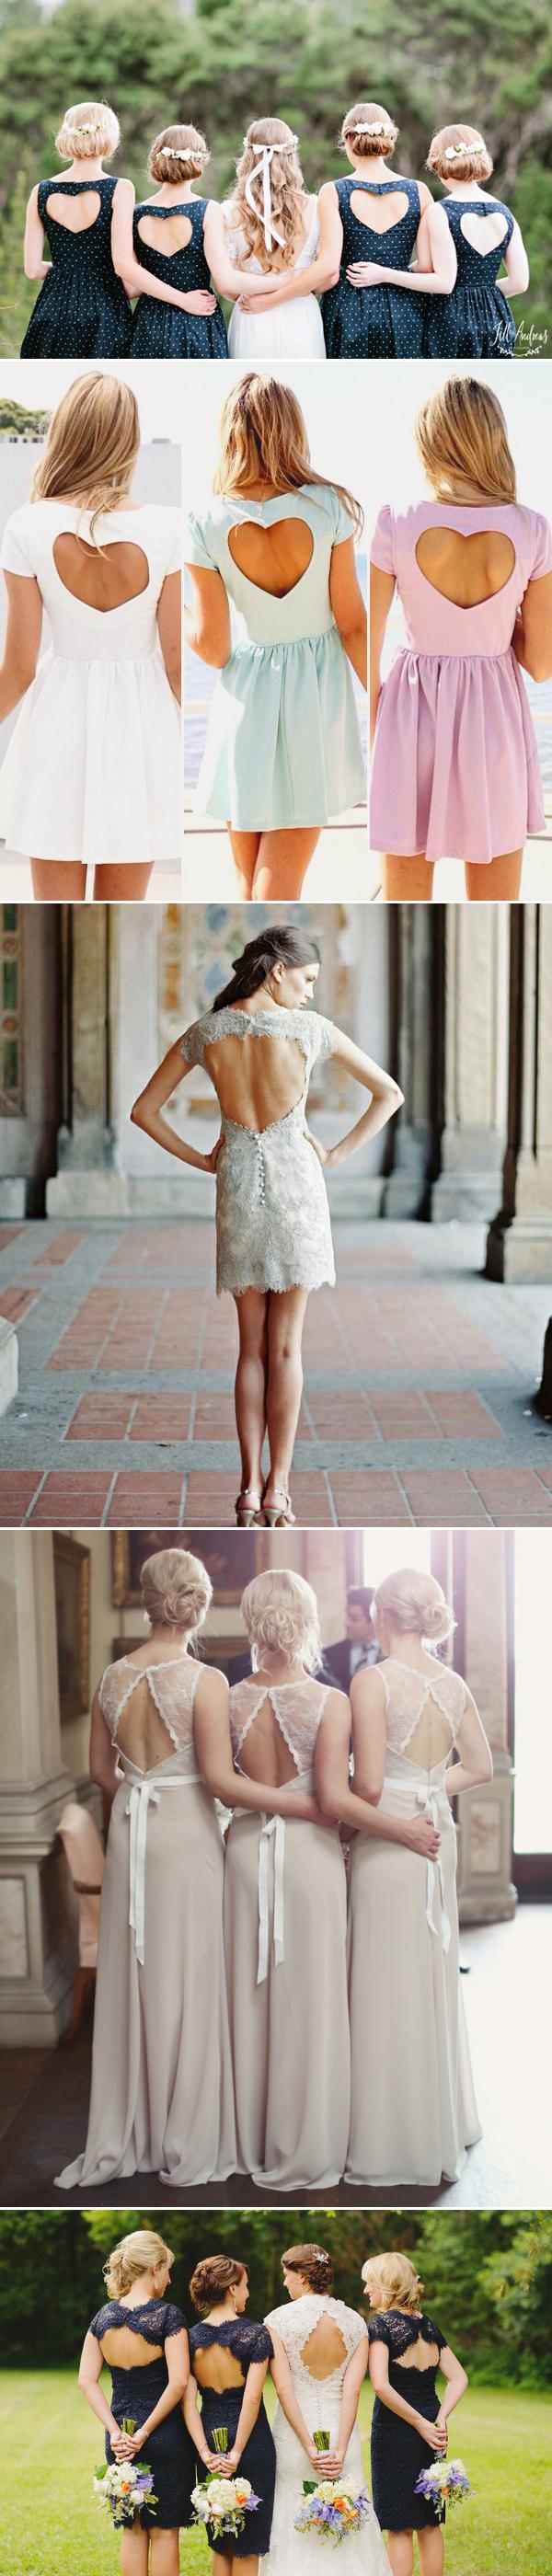 bridesmaid01-keyhole